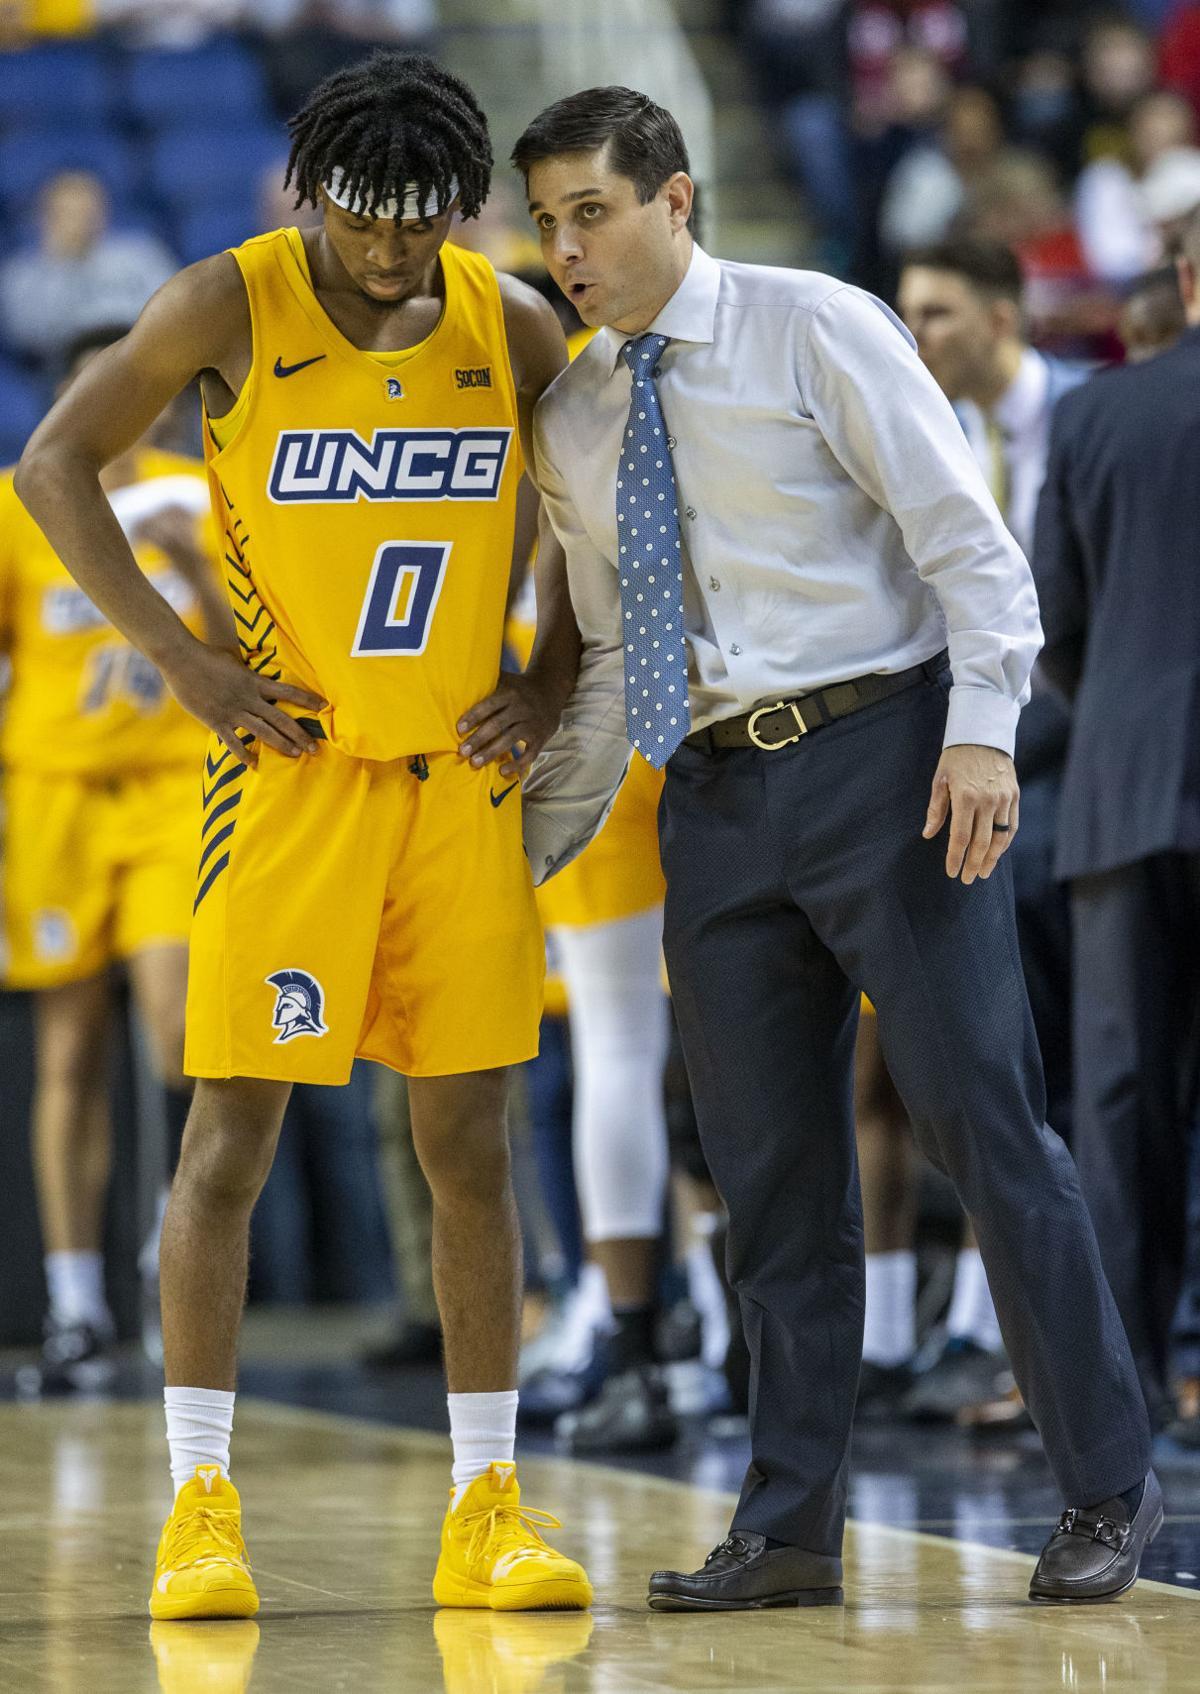 UNCG Mens Basketball (copy)